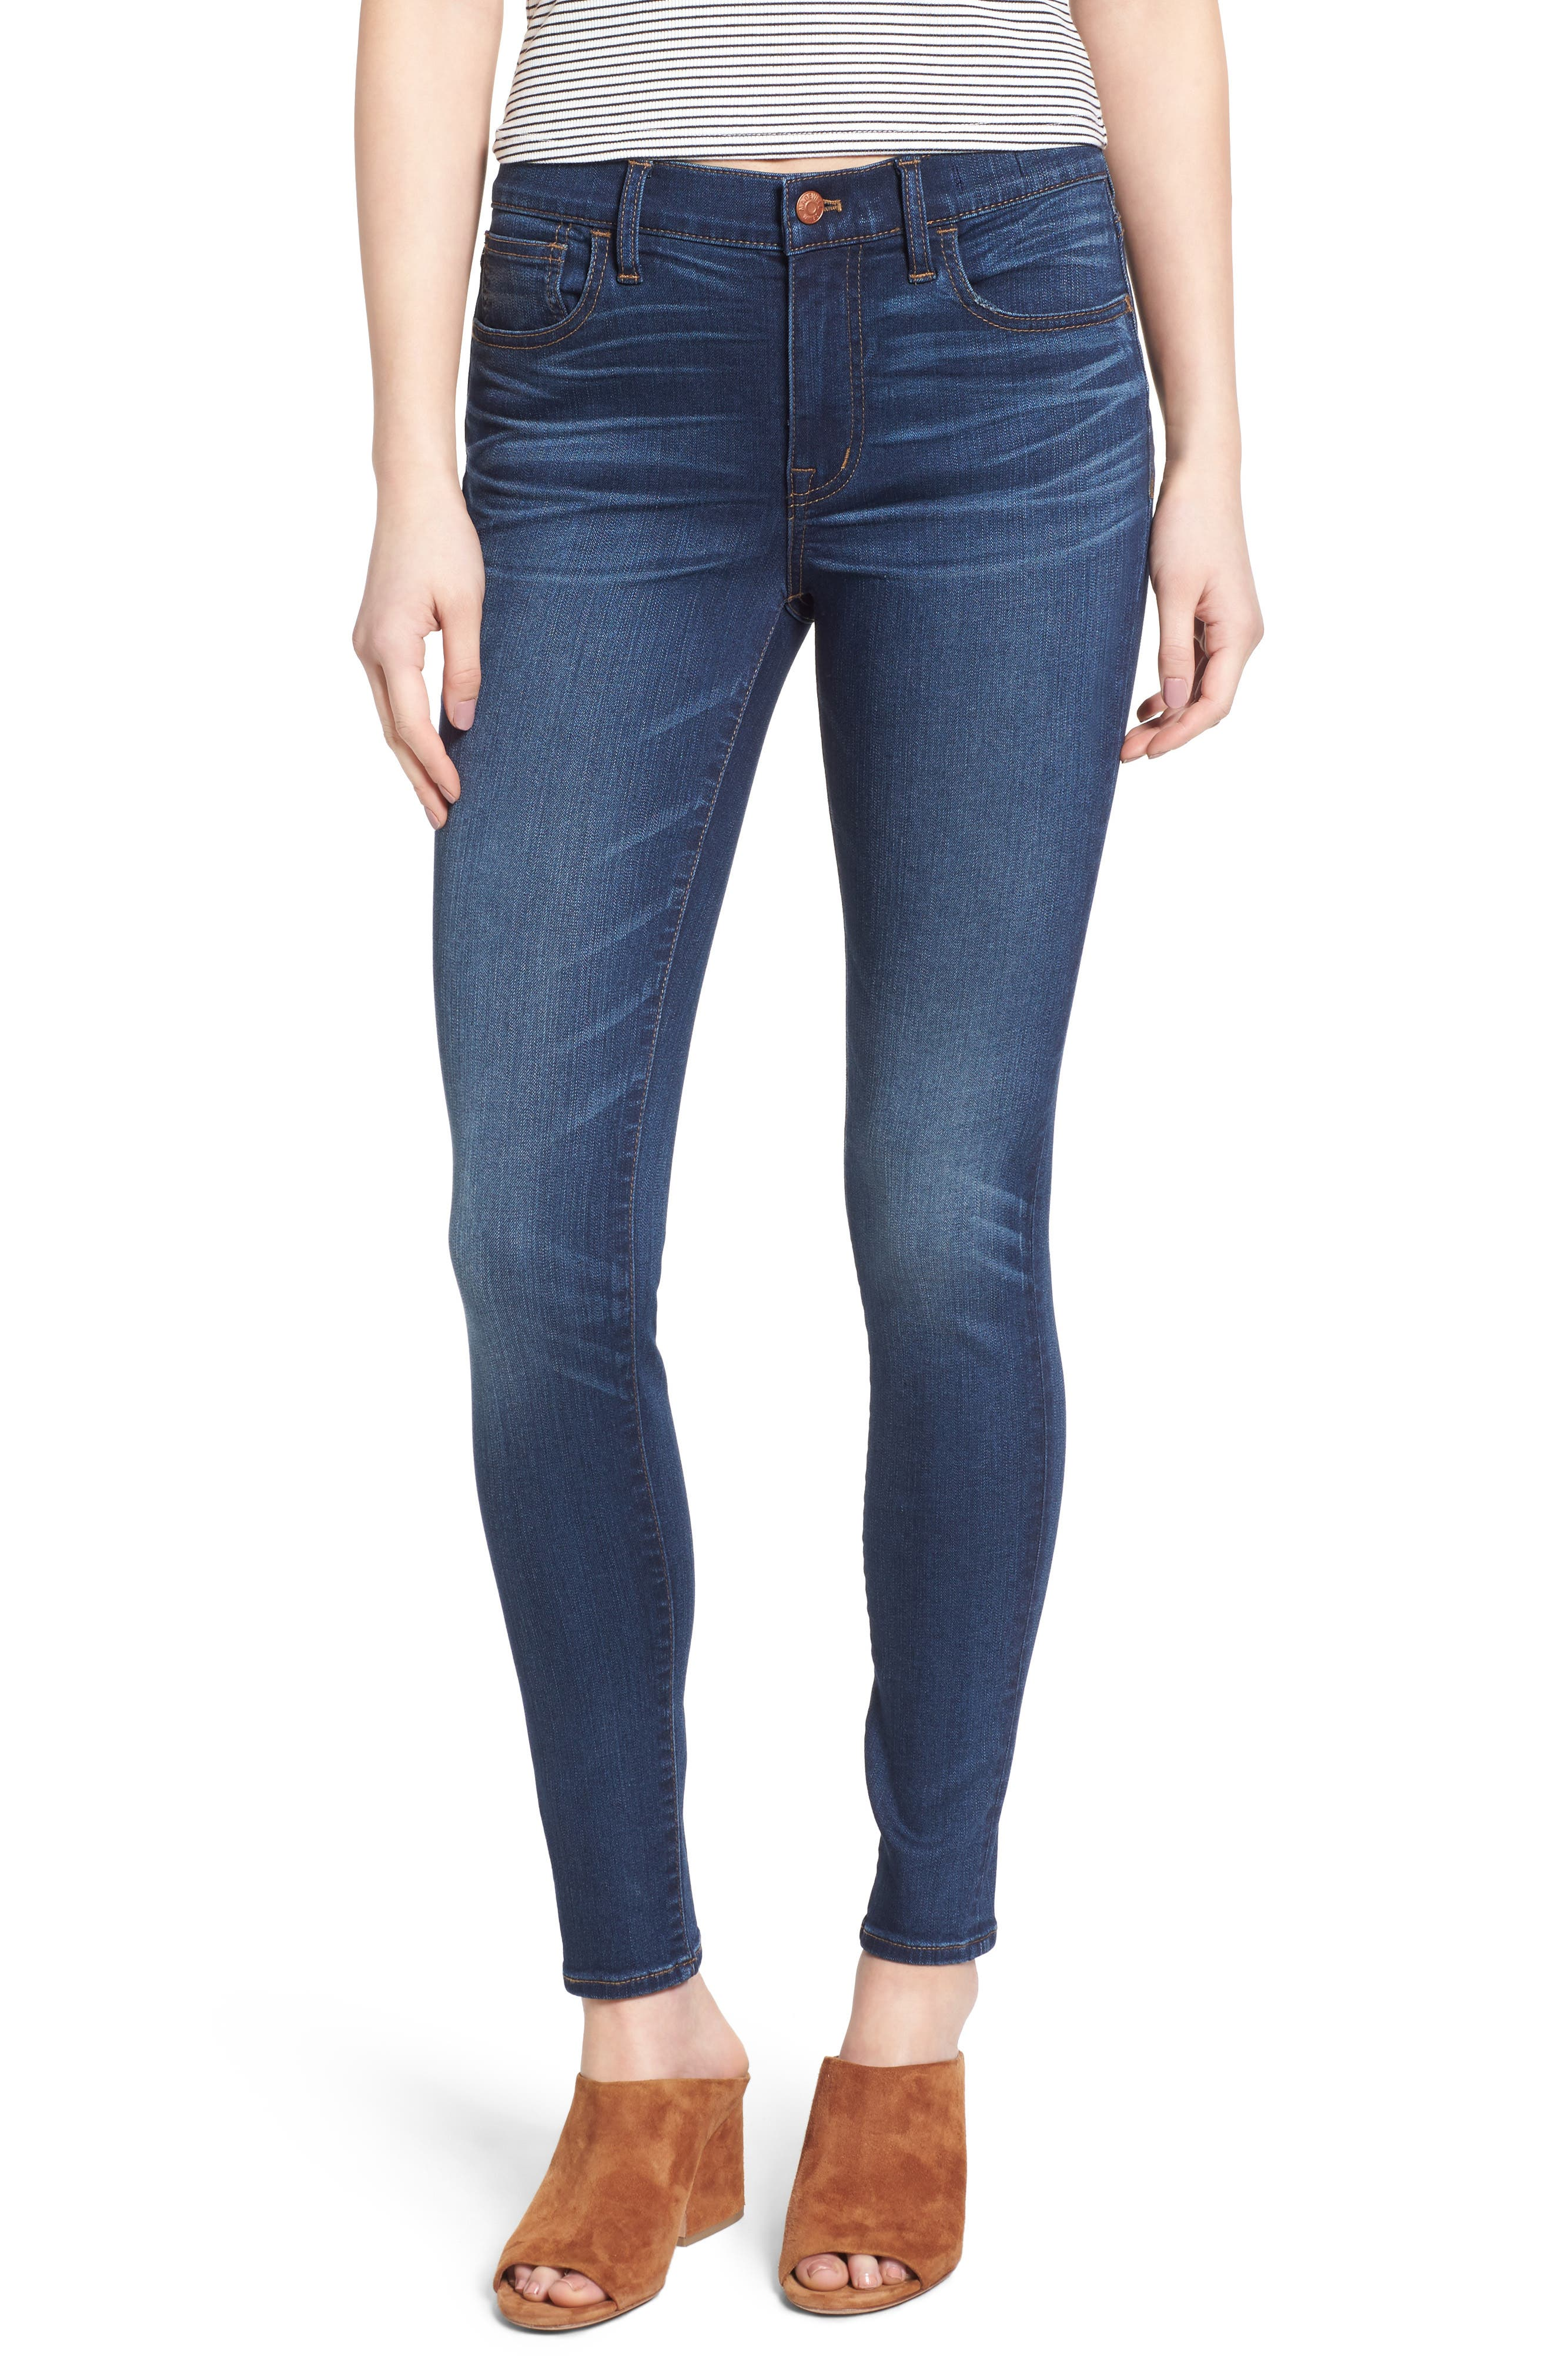 Roadtripper Jeans,                         Main,                         color, Darryl Wash